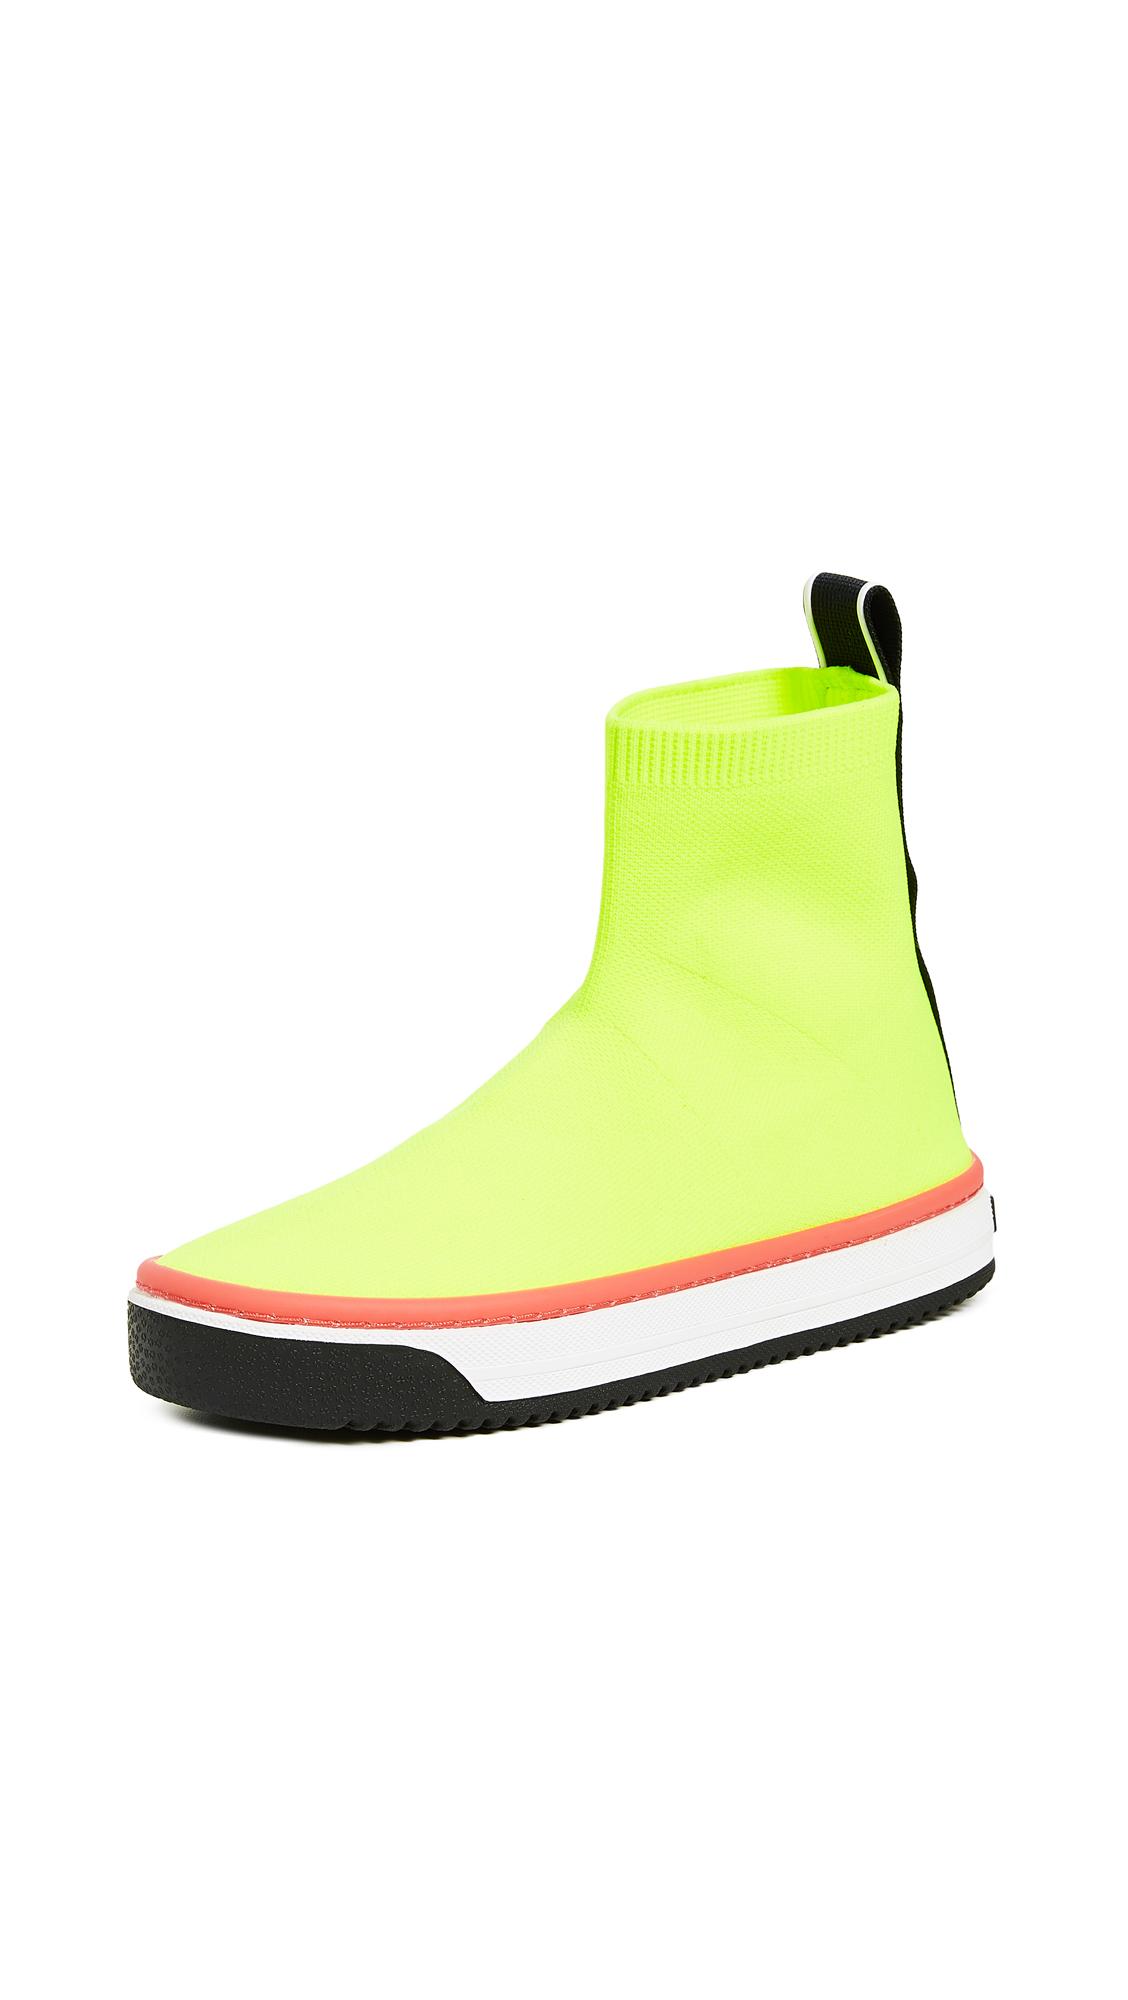 Marc Jacobs Dart Sock Sneakers - Yellow